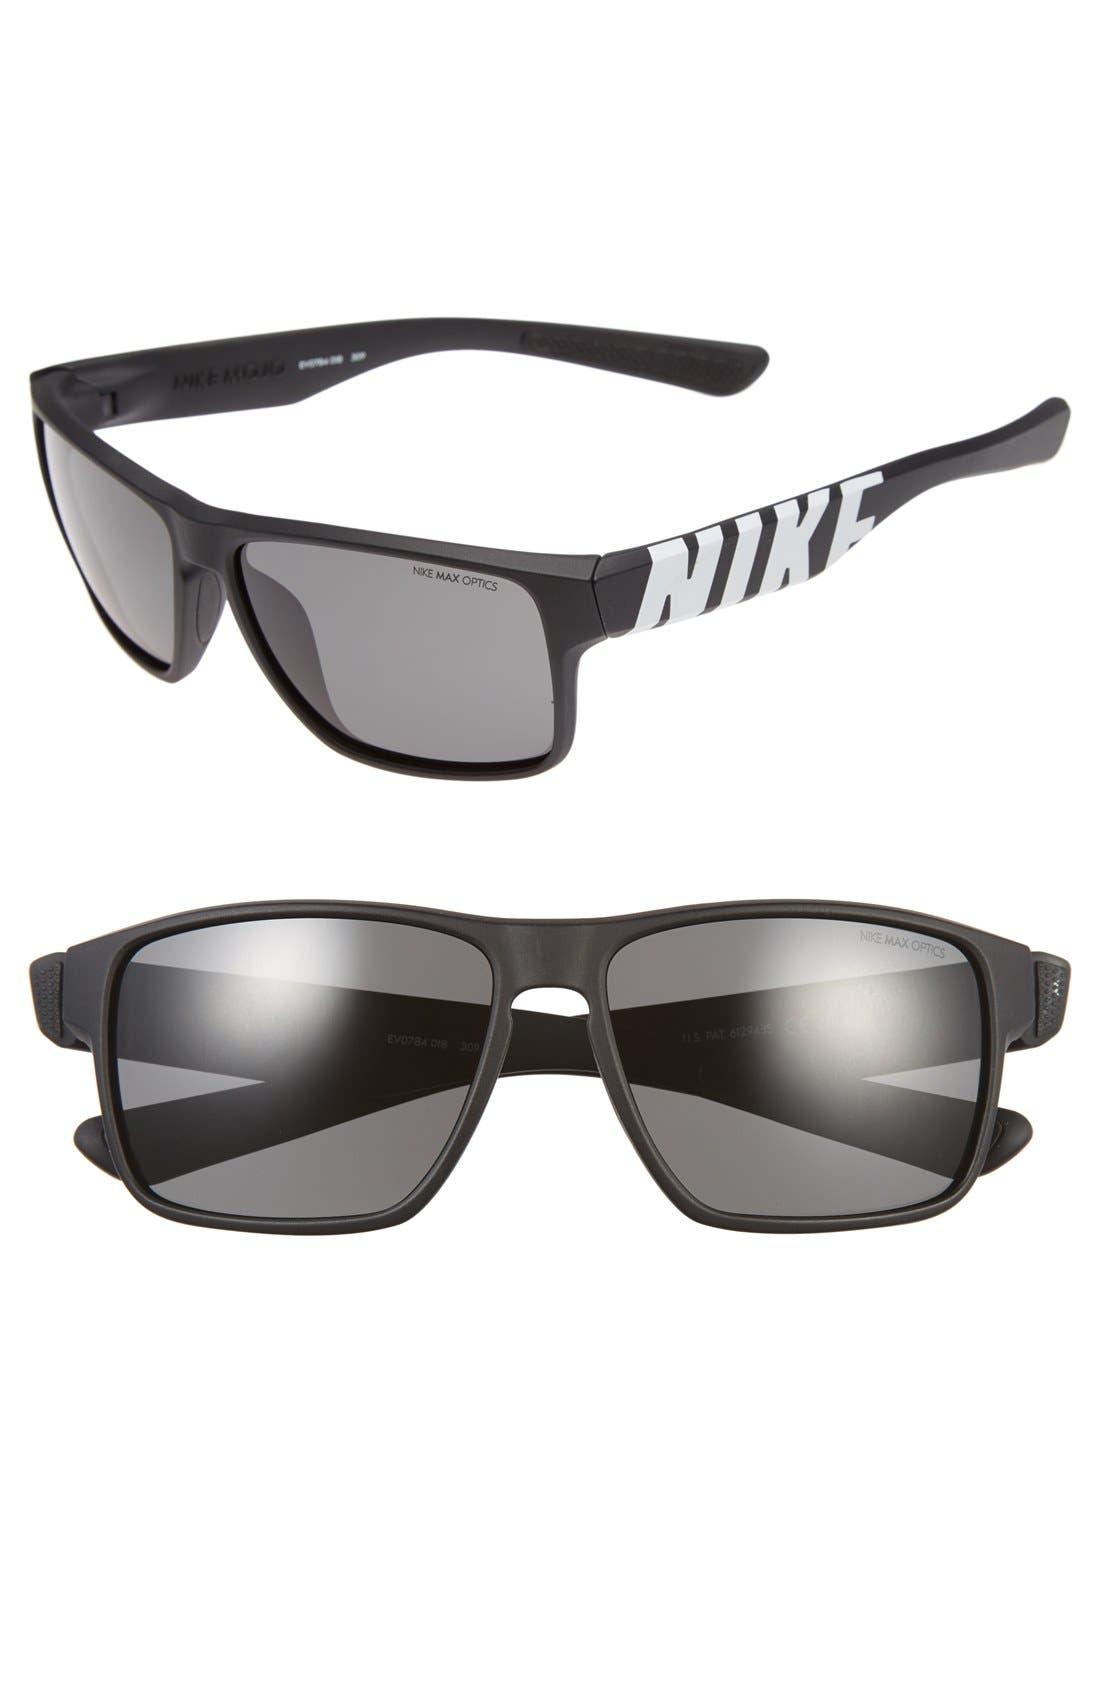 NIKE Mojo 59mm Sunglasses